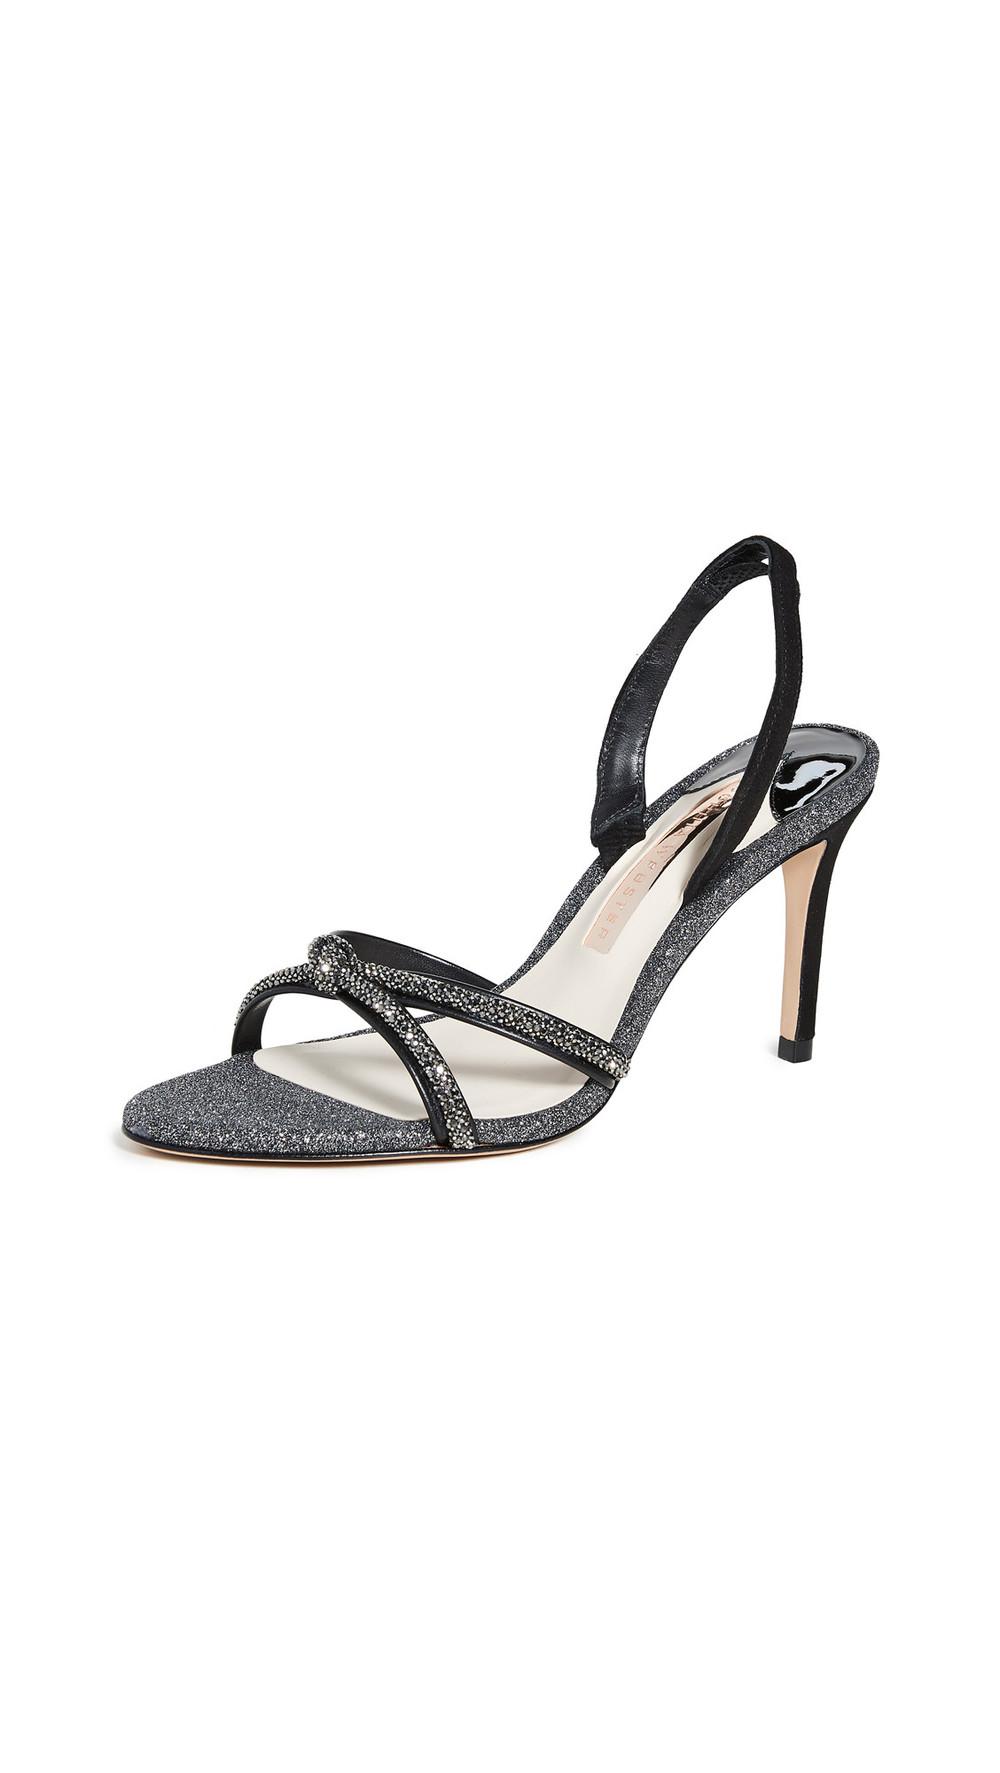 Sophia Webster Giovanna Mid Sandals in black / silver